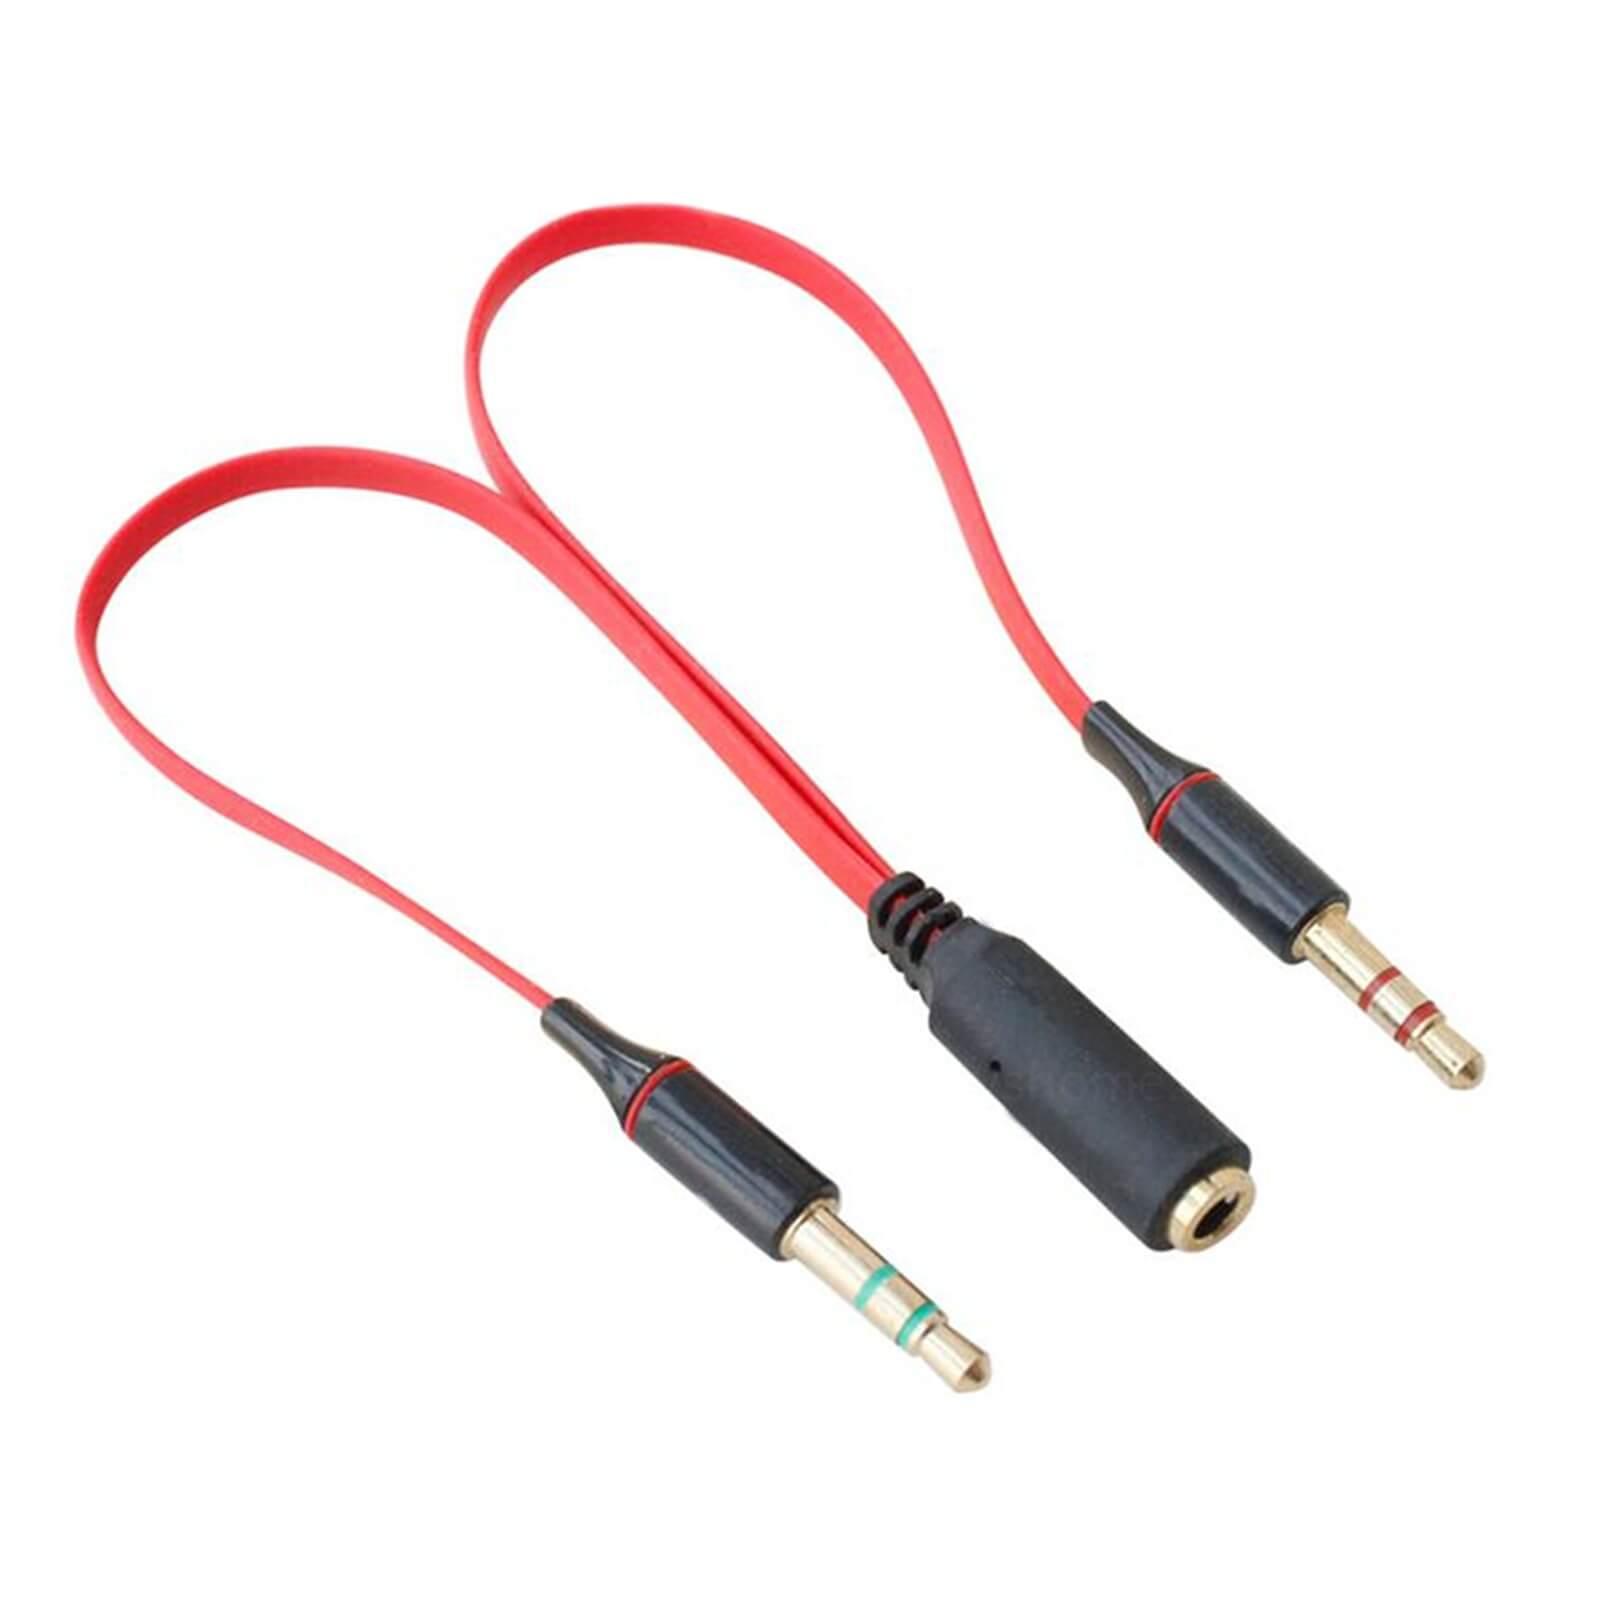 Cut The Male Male 3 5mm Headphone Lead And